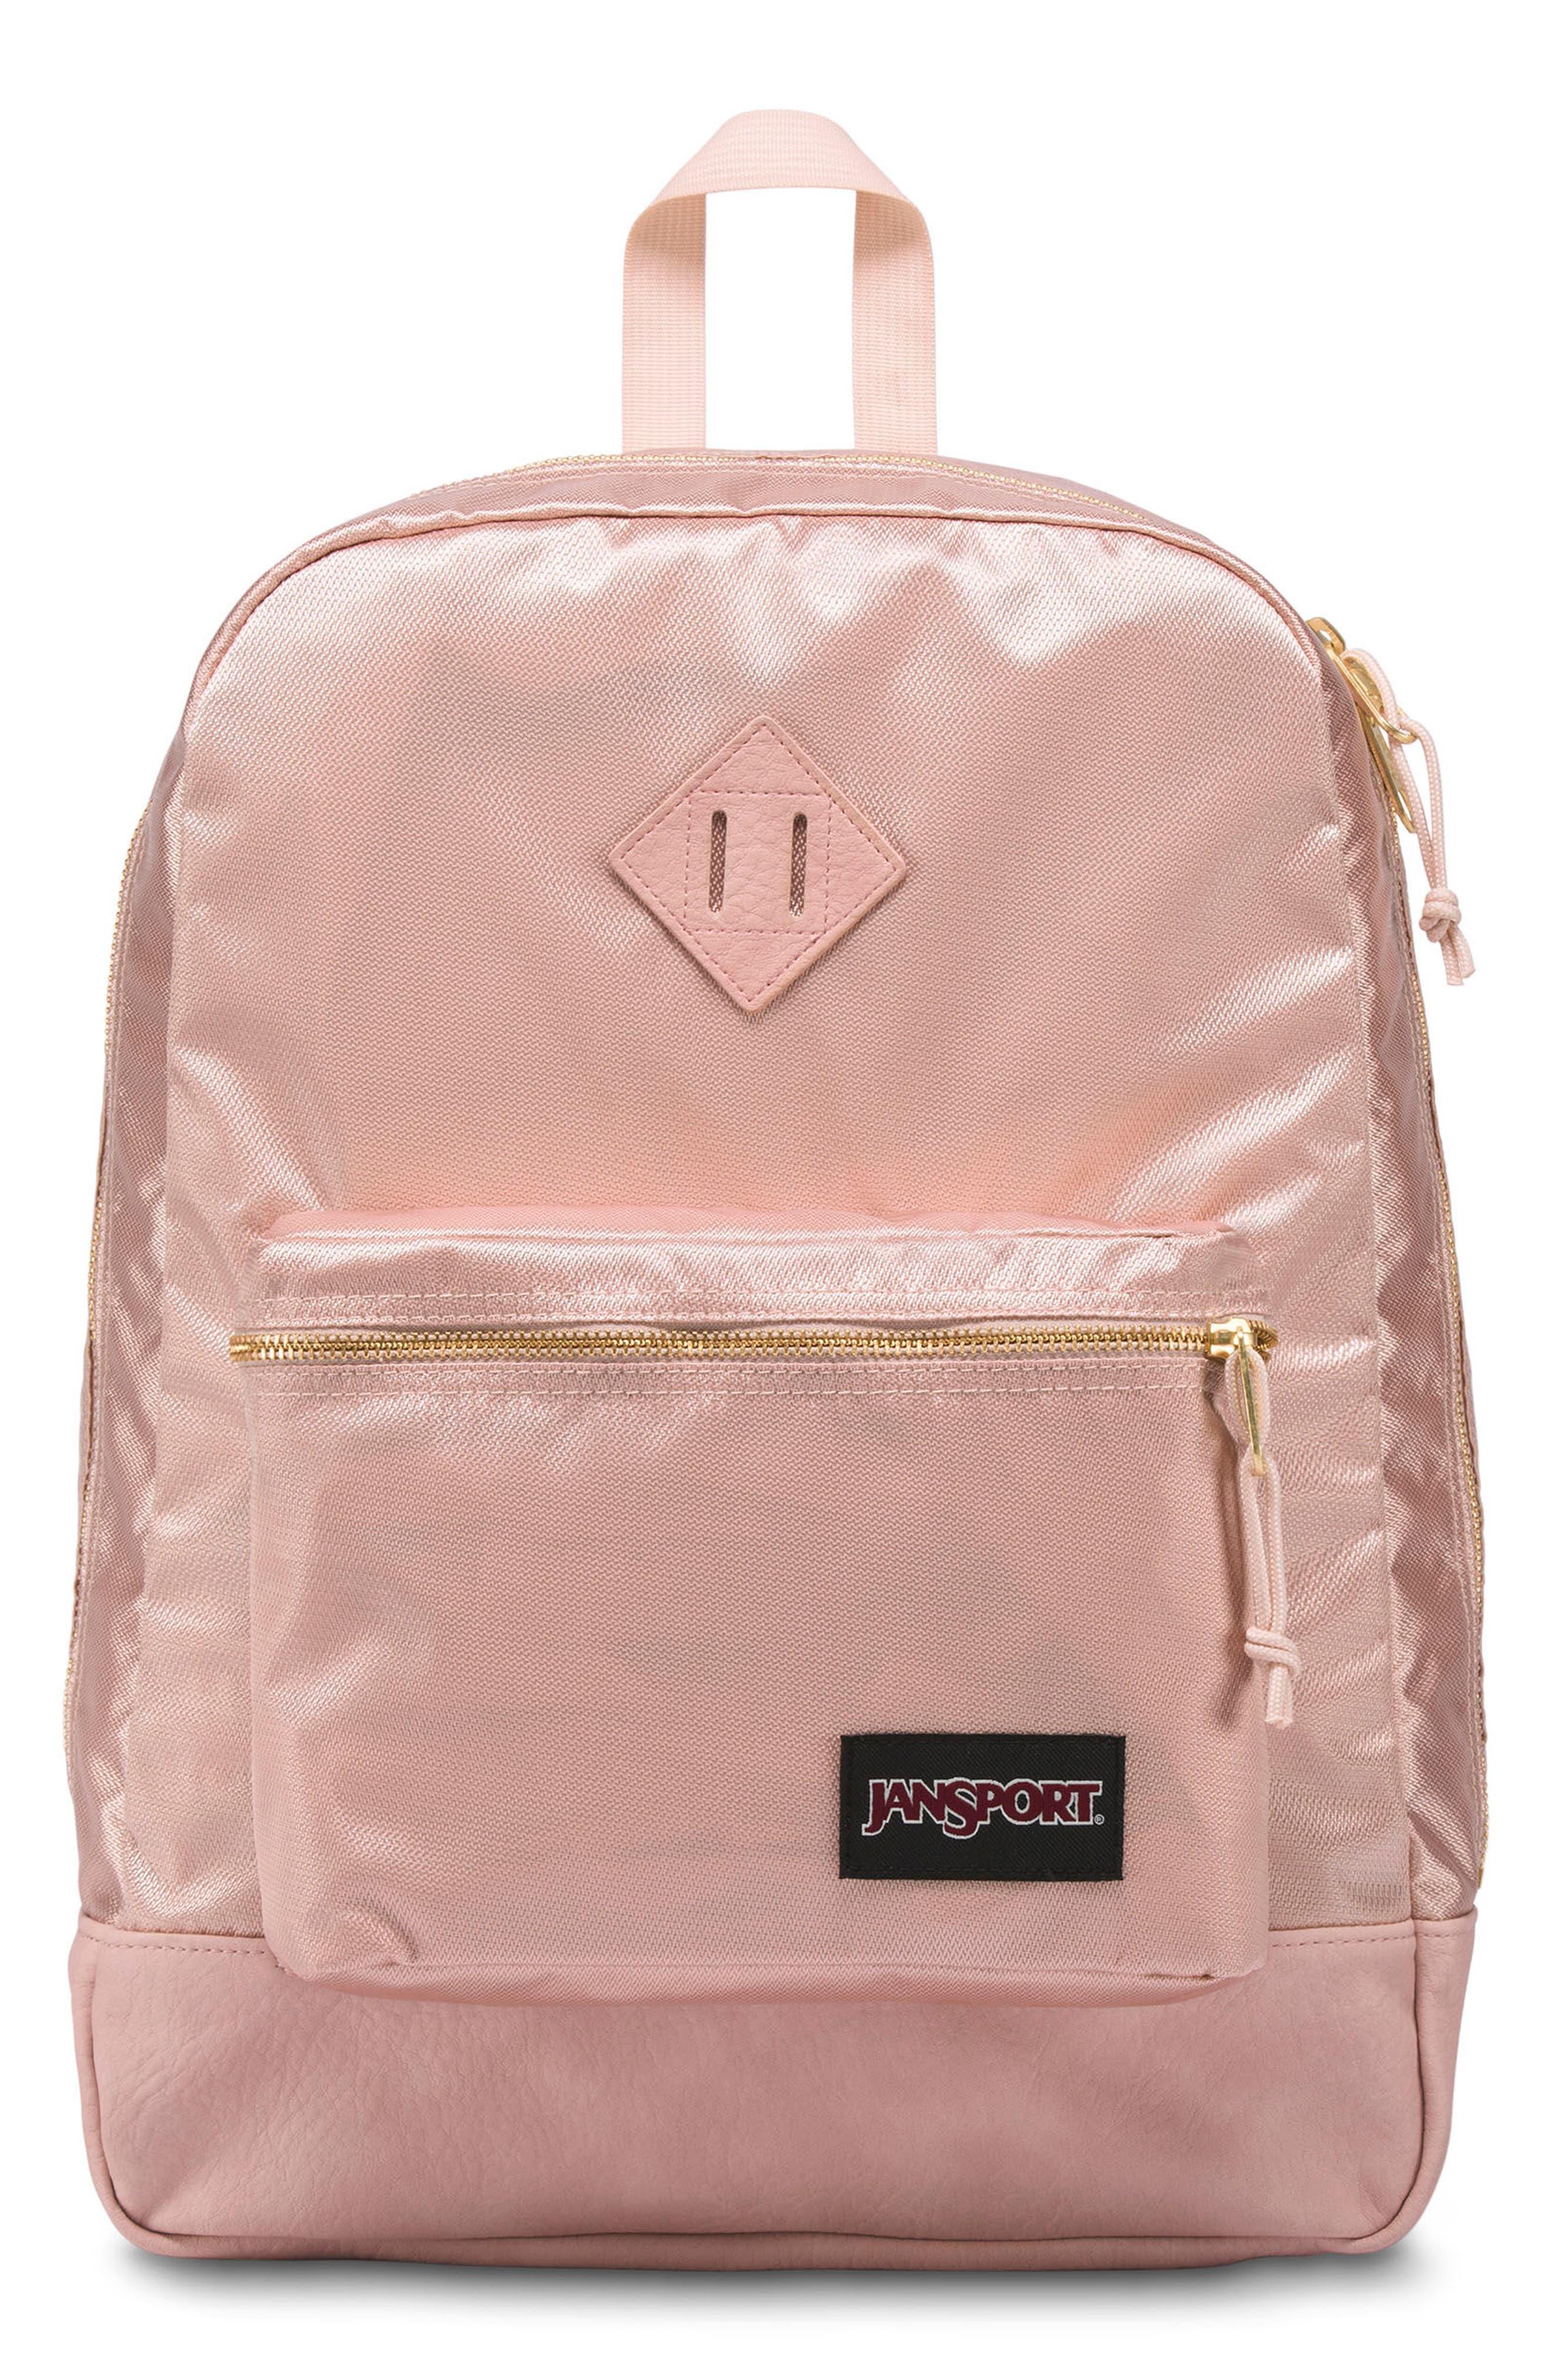 Super FX Gym Backpack,                             Main thumbnail 1, color,                             ROSE SMOKE GOLD